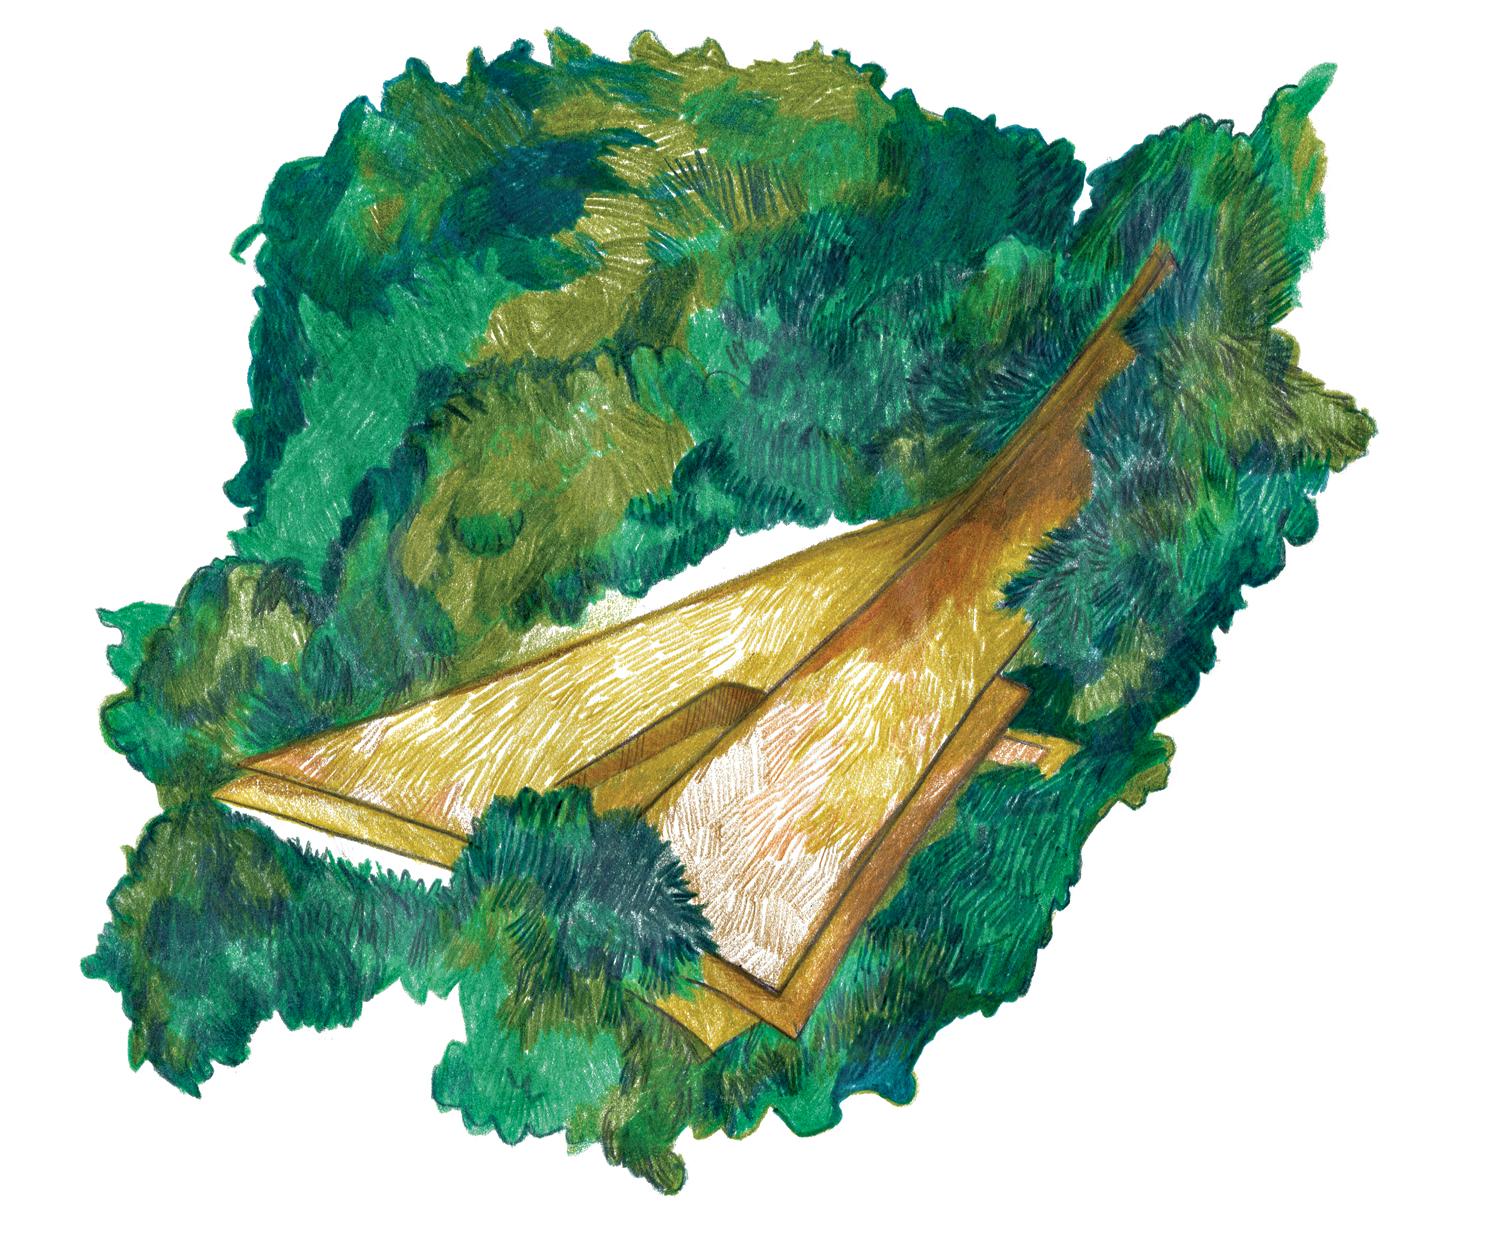 unitarian church victor lundy illustration